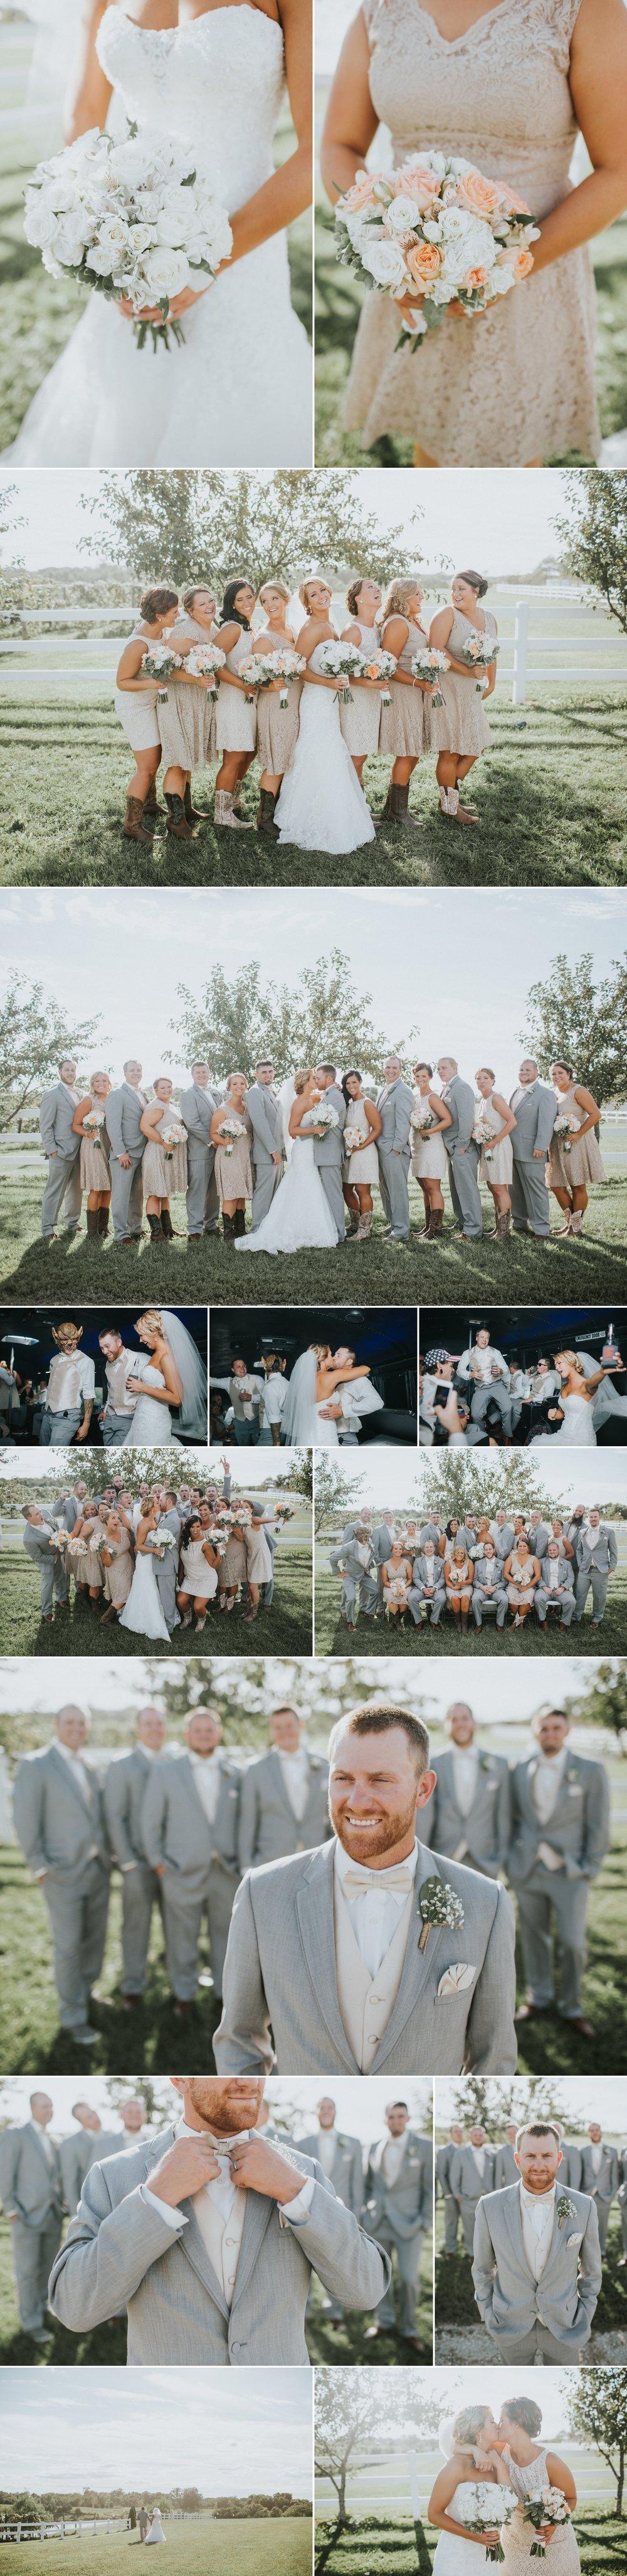 The Olson Wedding 4.jpg